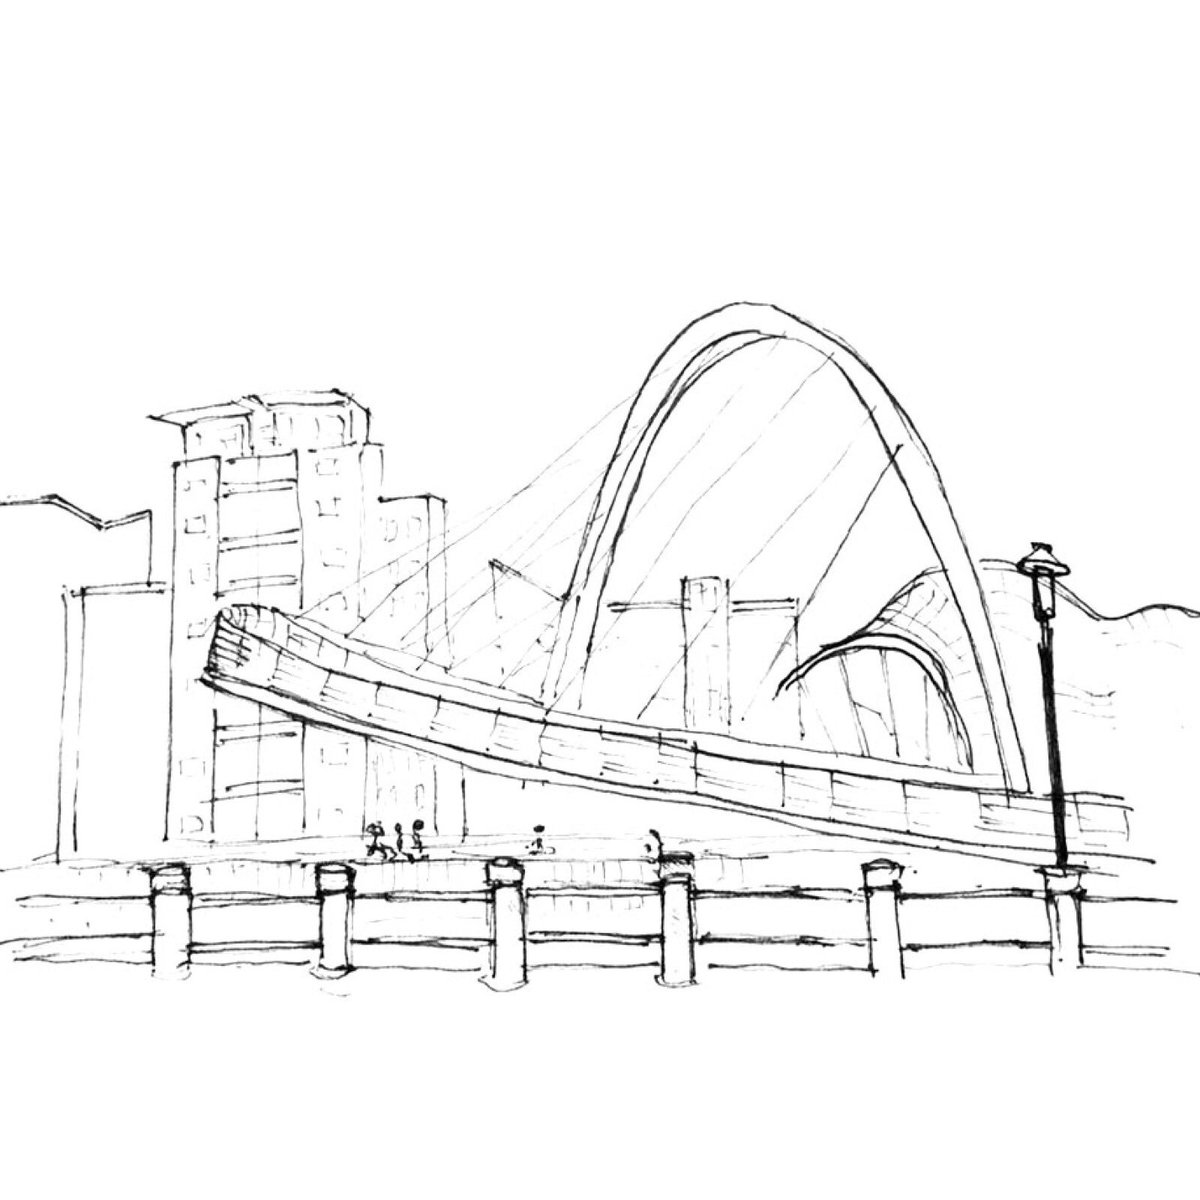 1200x1200 Eliott Wells On Twitter Quick Sketch Of Gateshead Millennium